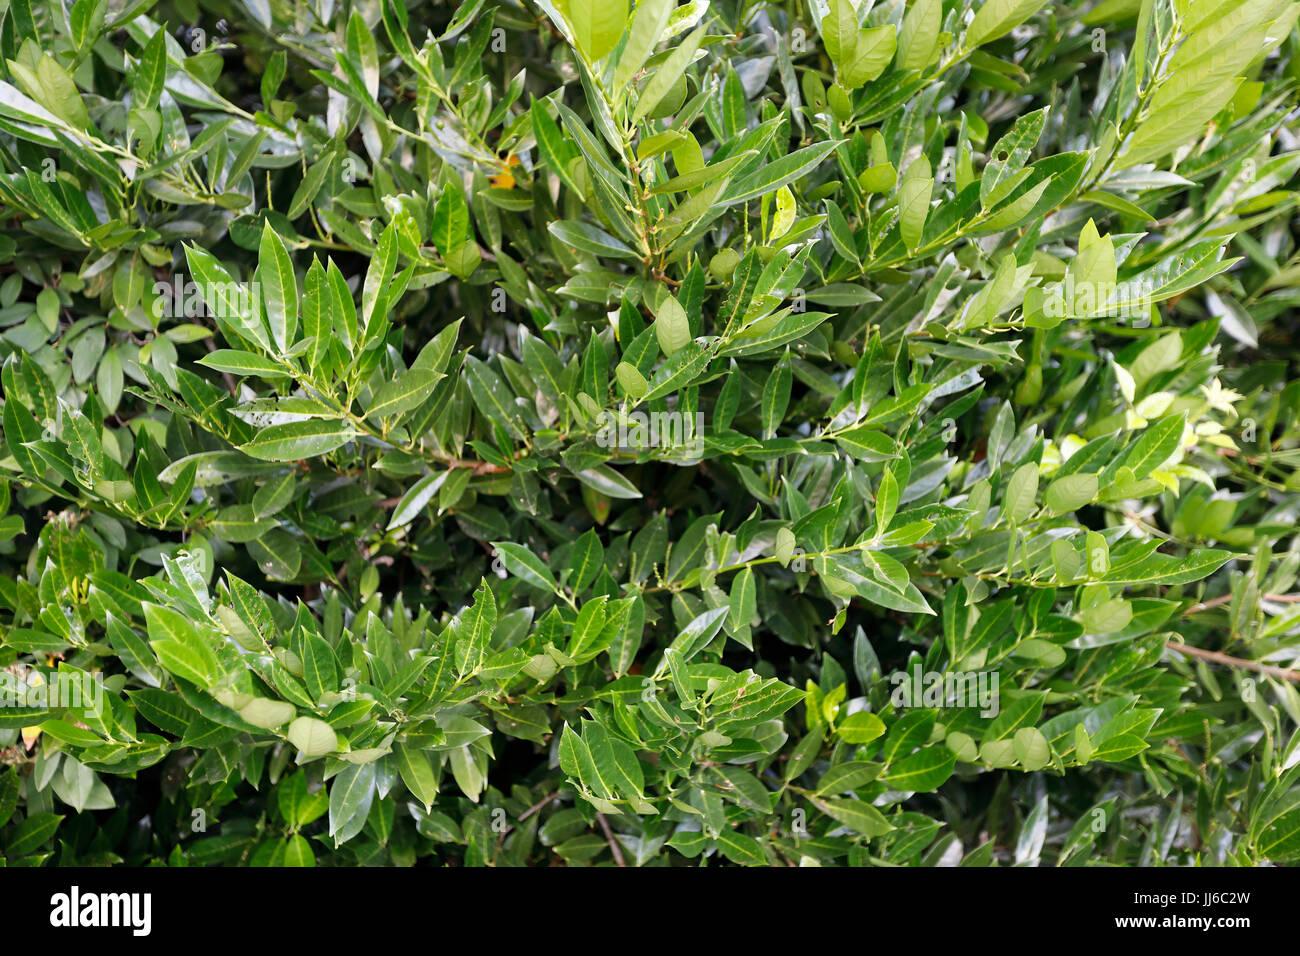 Laurel leaves - Stock Image